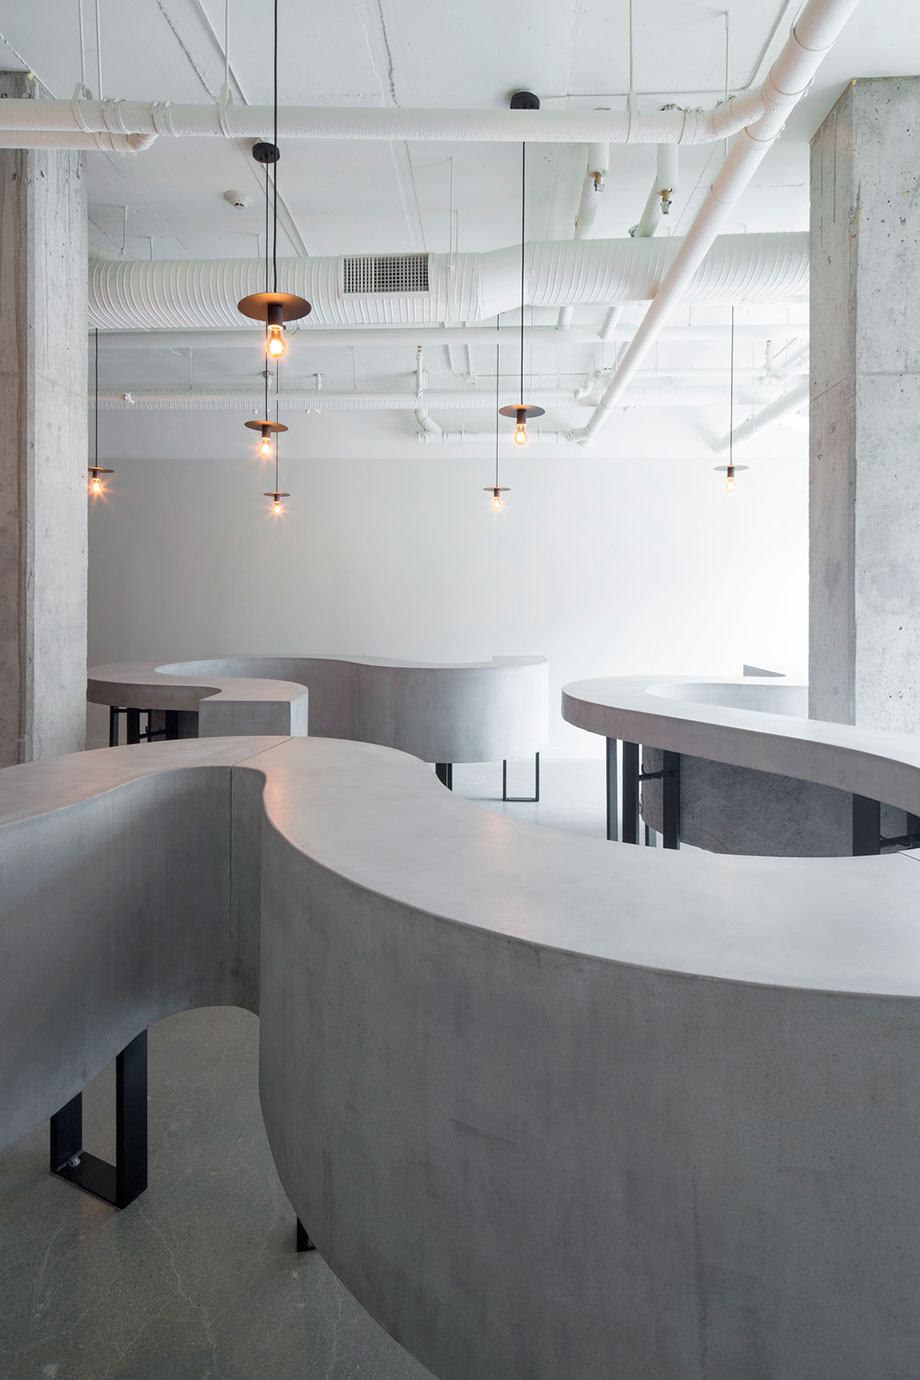 shuck shuck de batay-csorba architects (3) - foto silentsama